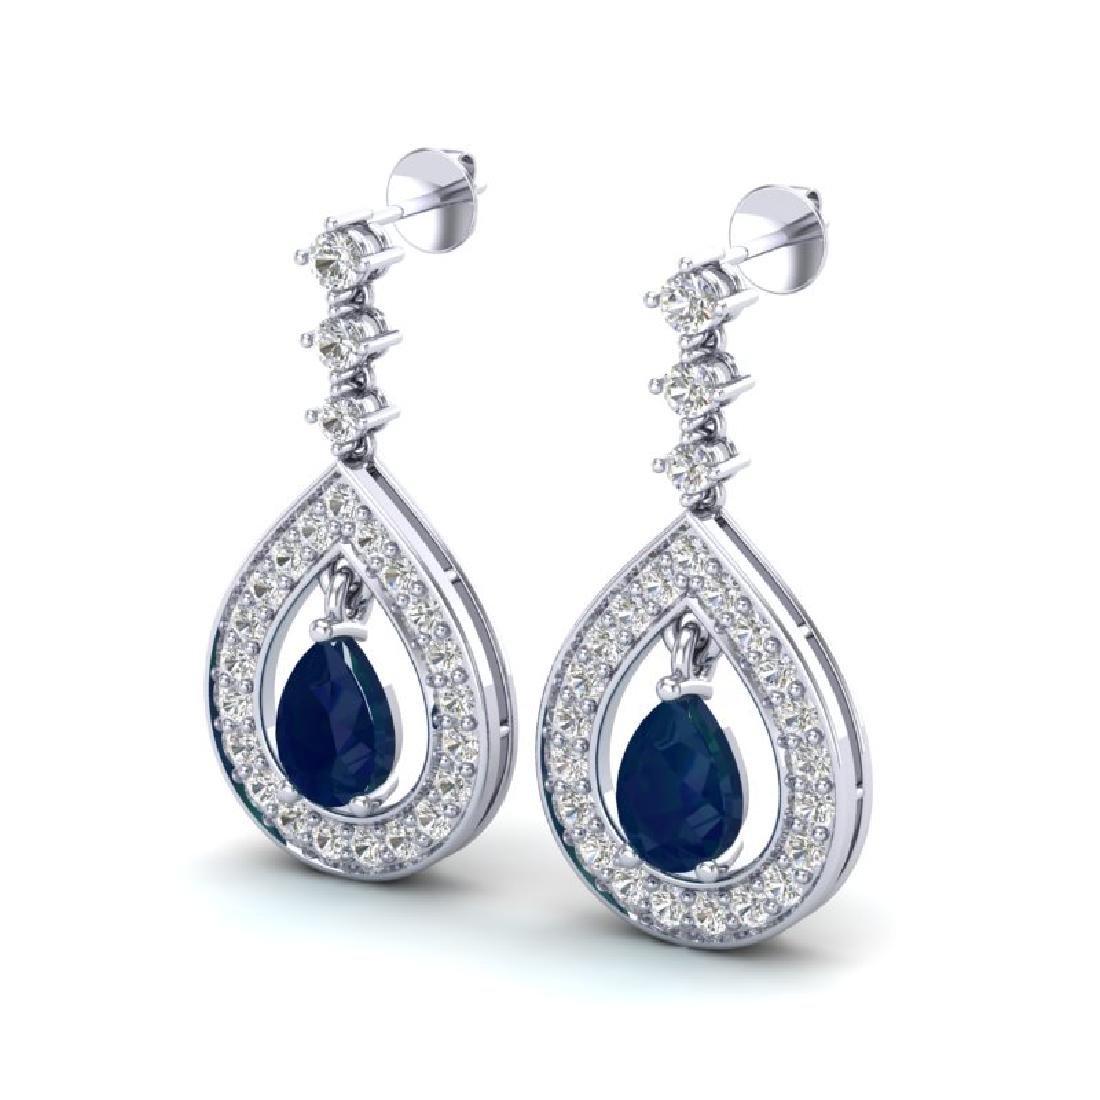 2.25 CTW Sapphire & Micro Pave VS/SI Diamond Earrings